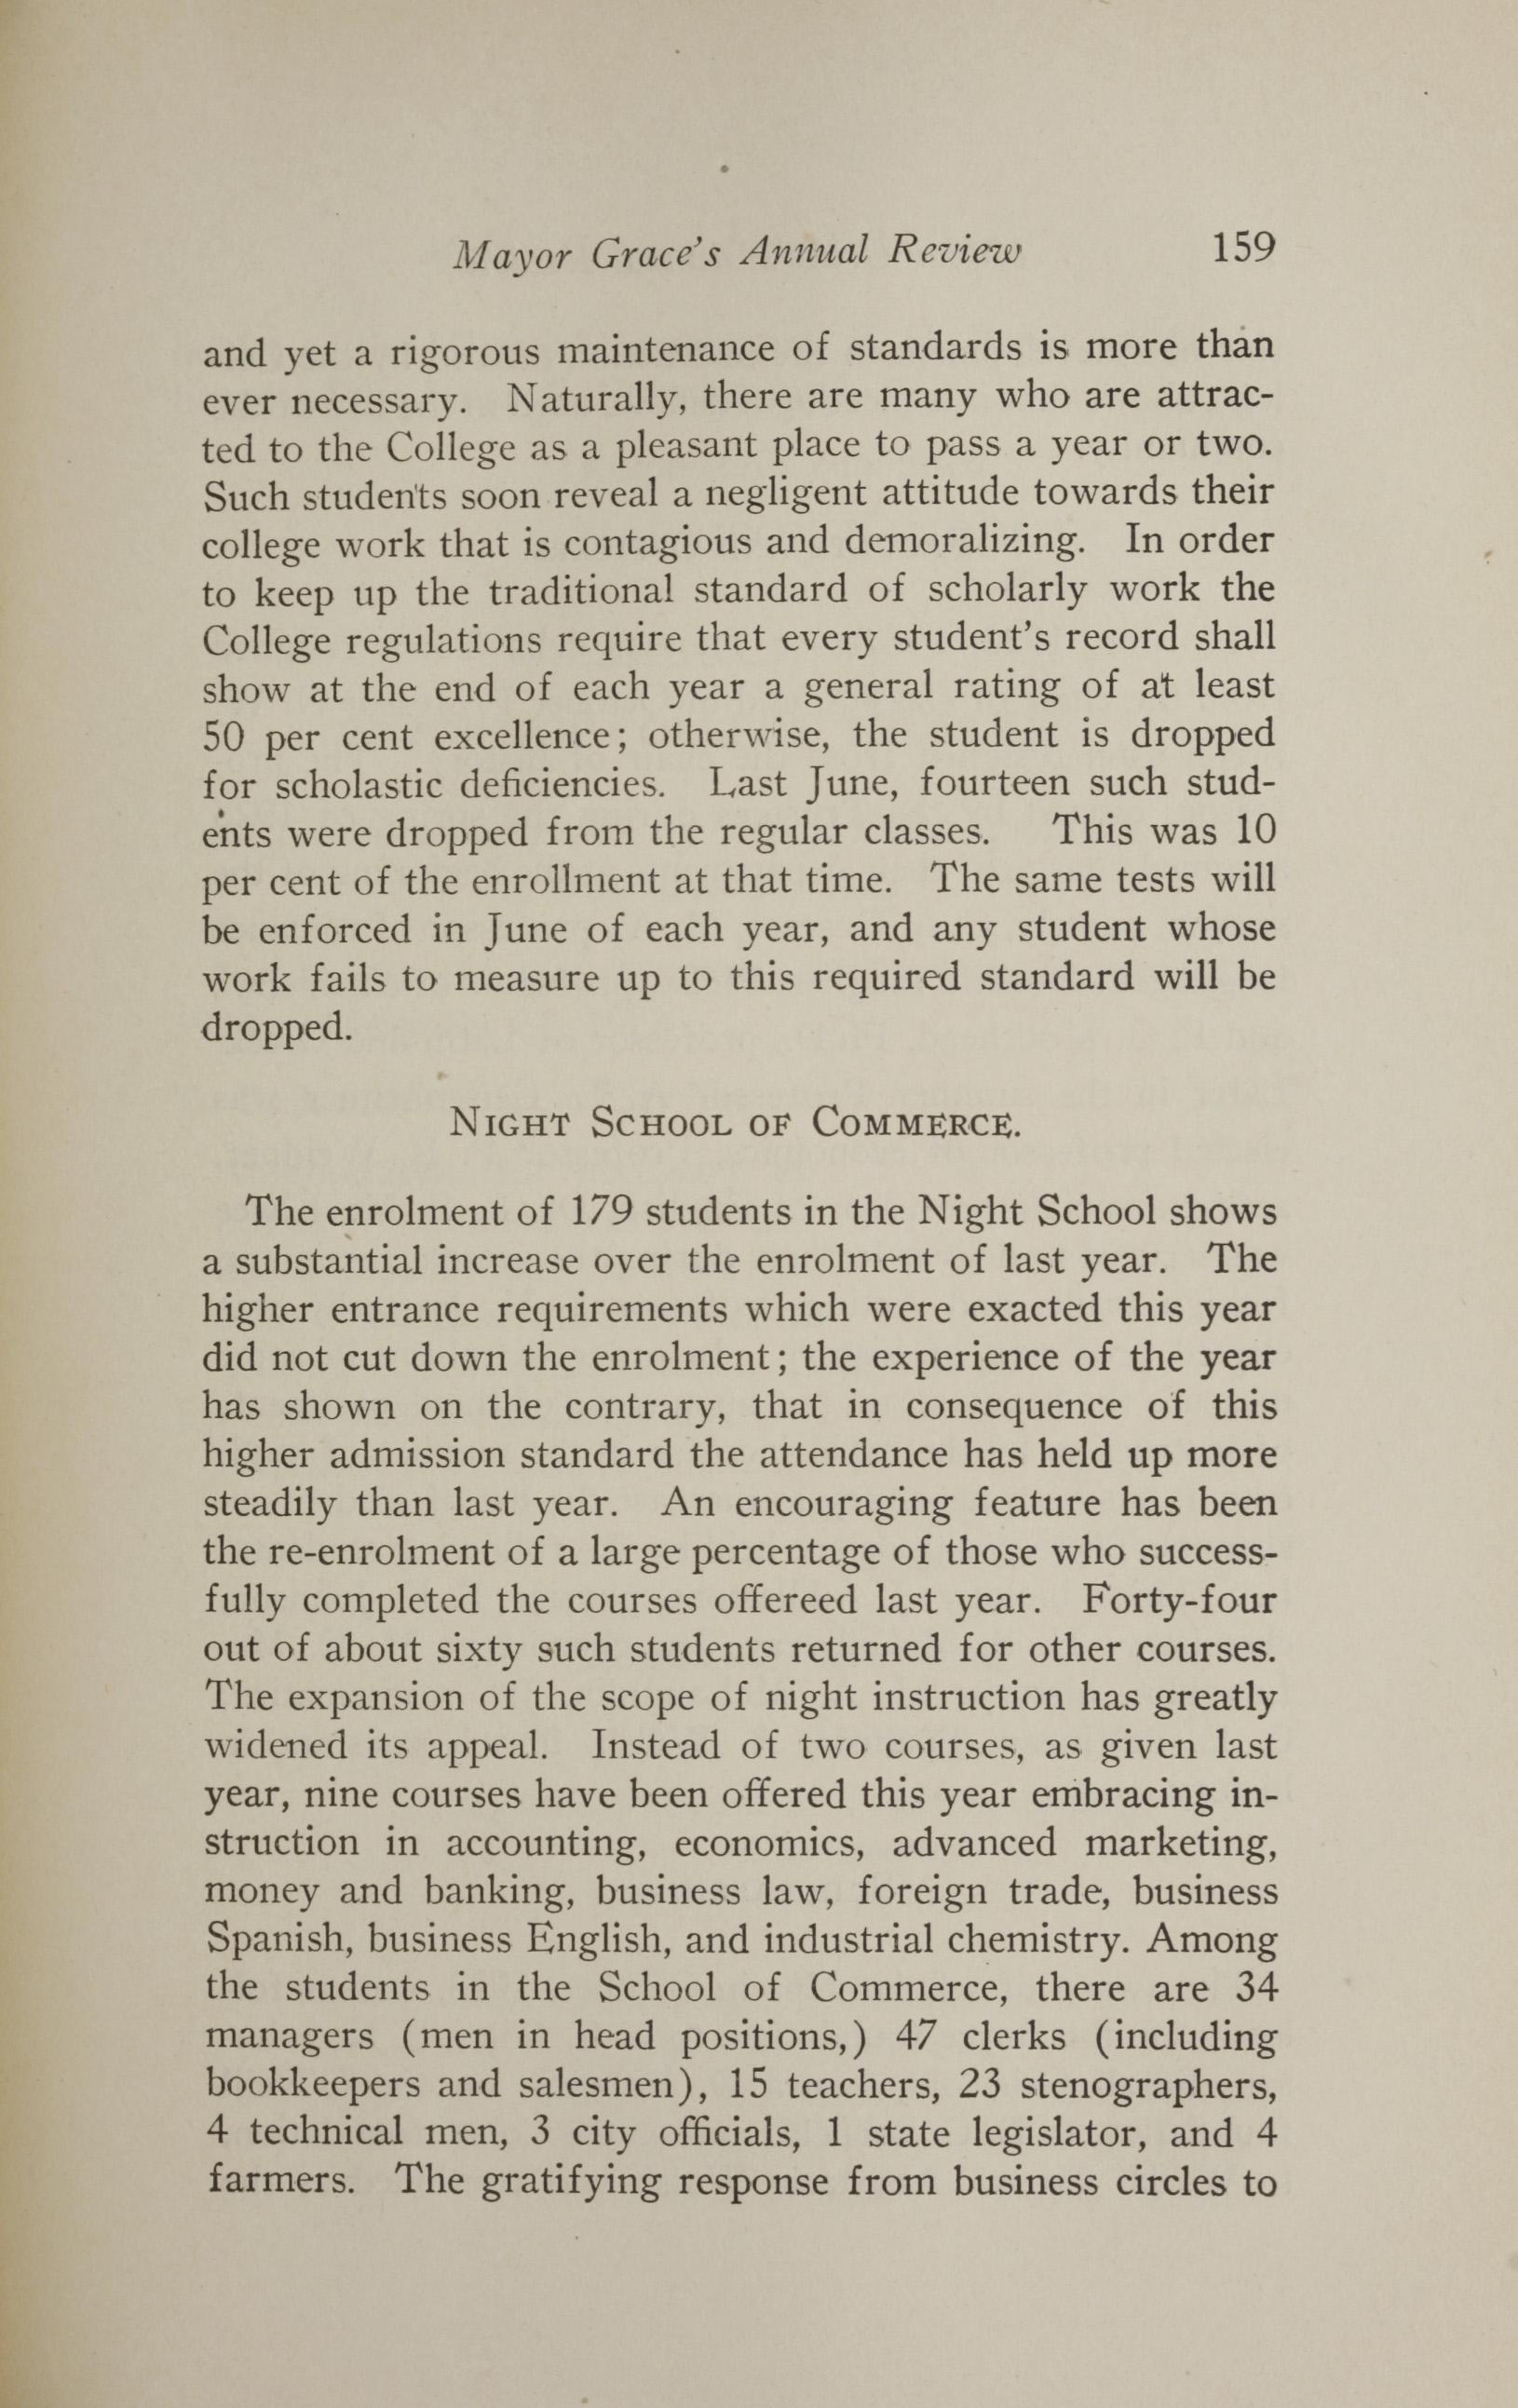 Charleston Yearbook, 1923, page 159